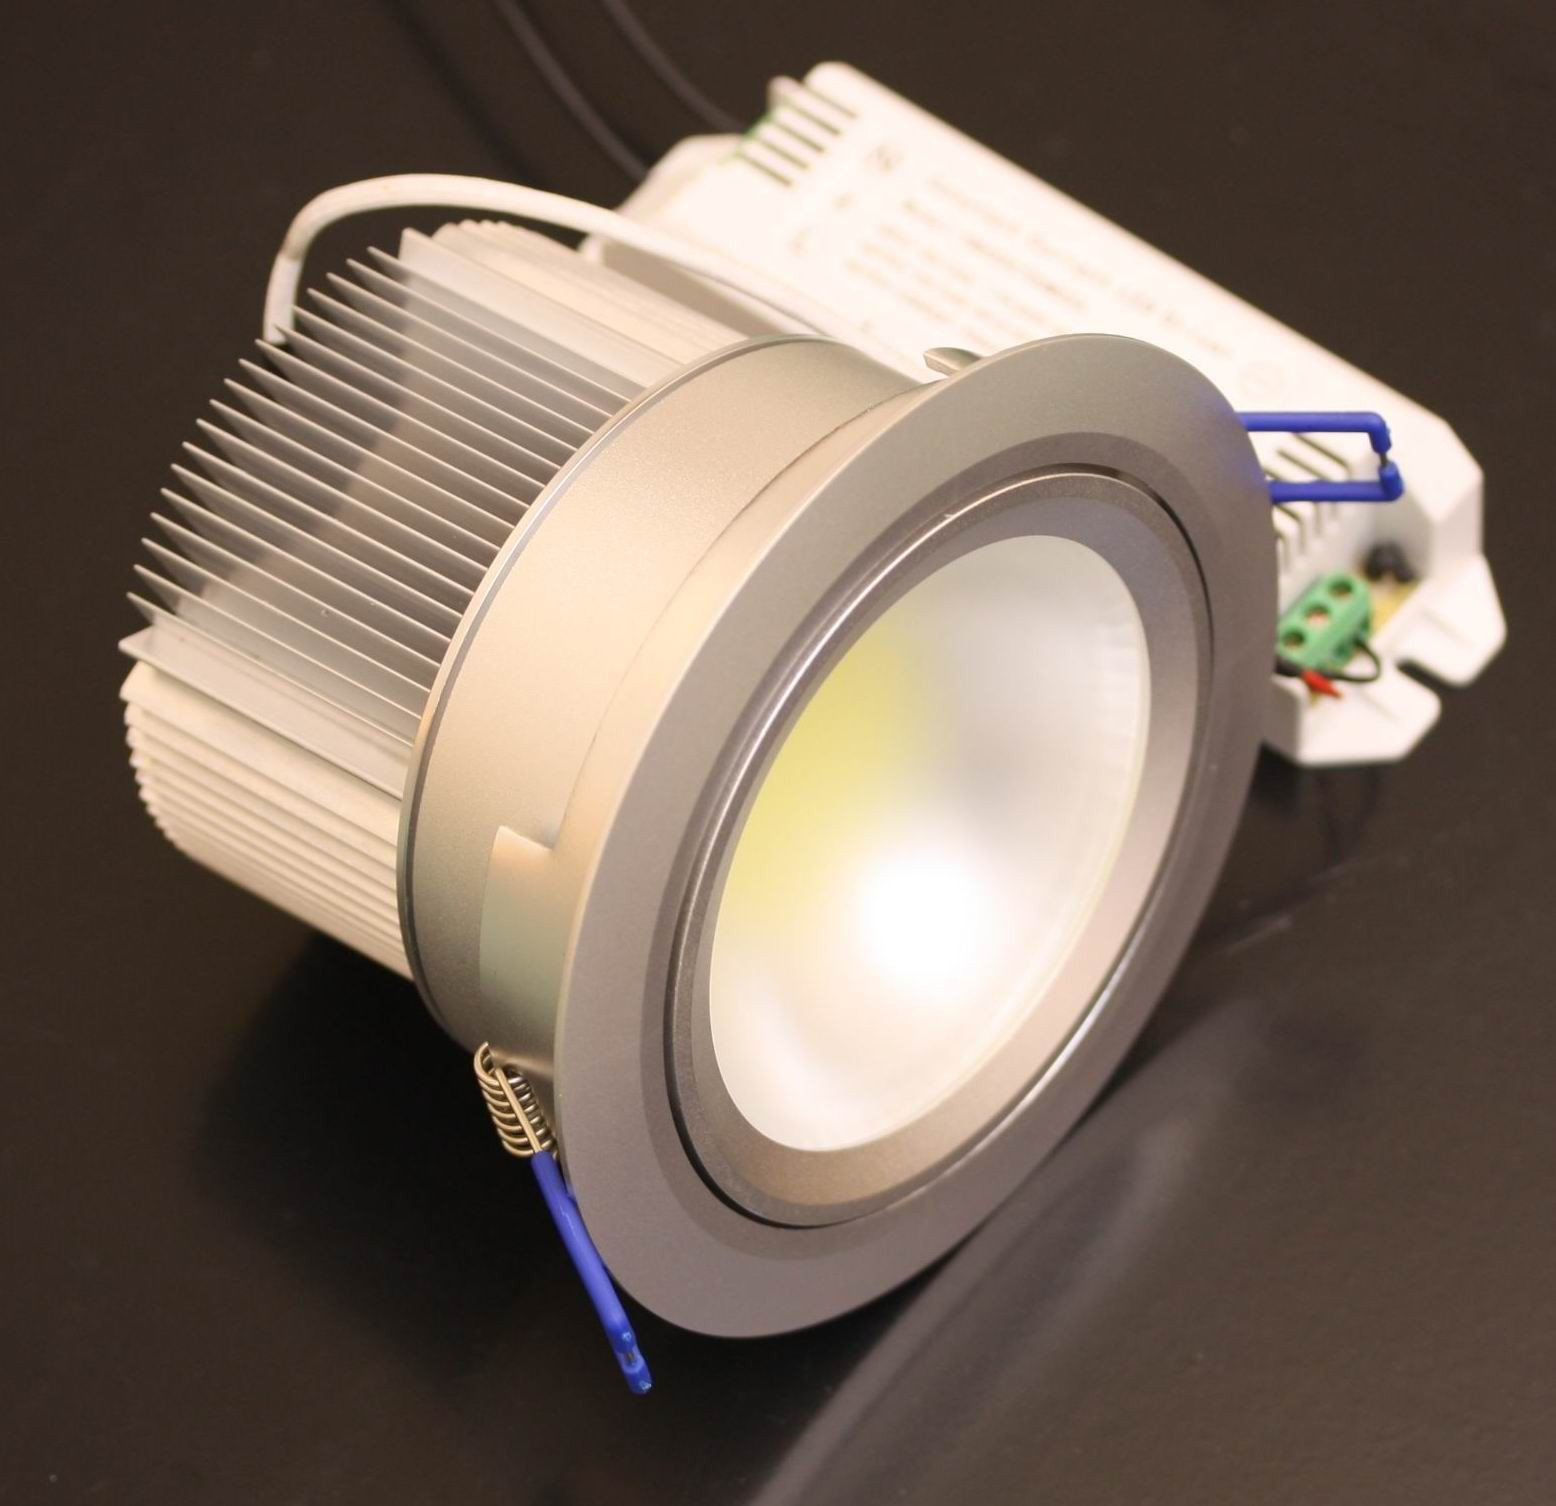 led筒灯—led筒灯尺寸规格是多少